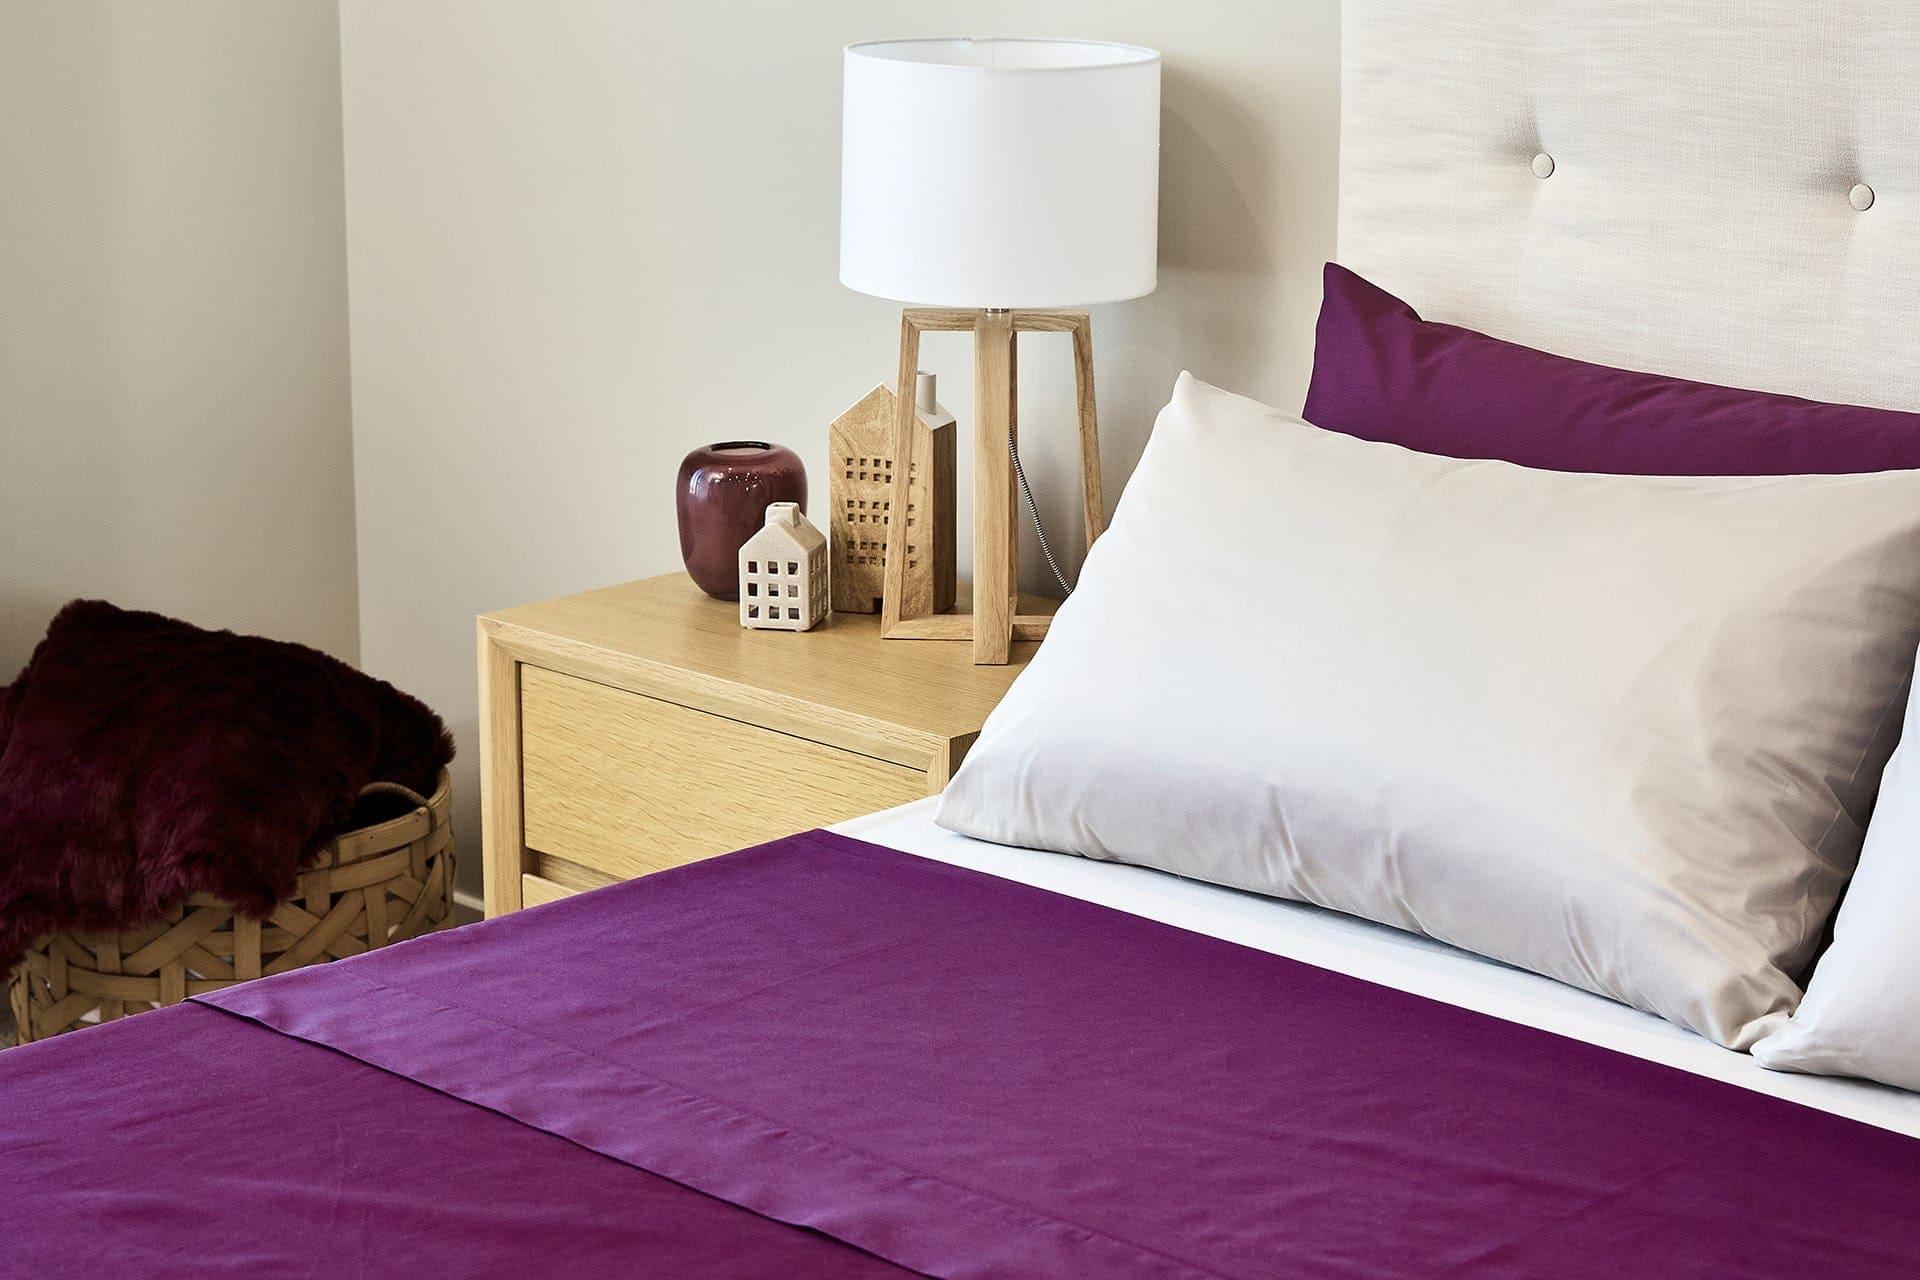 premium percale sheet set from lorraine lea in purple